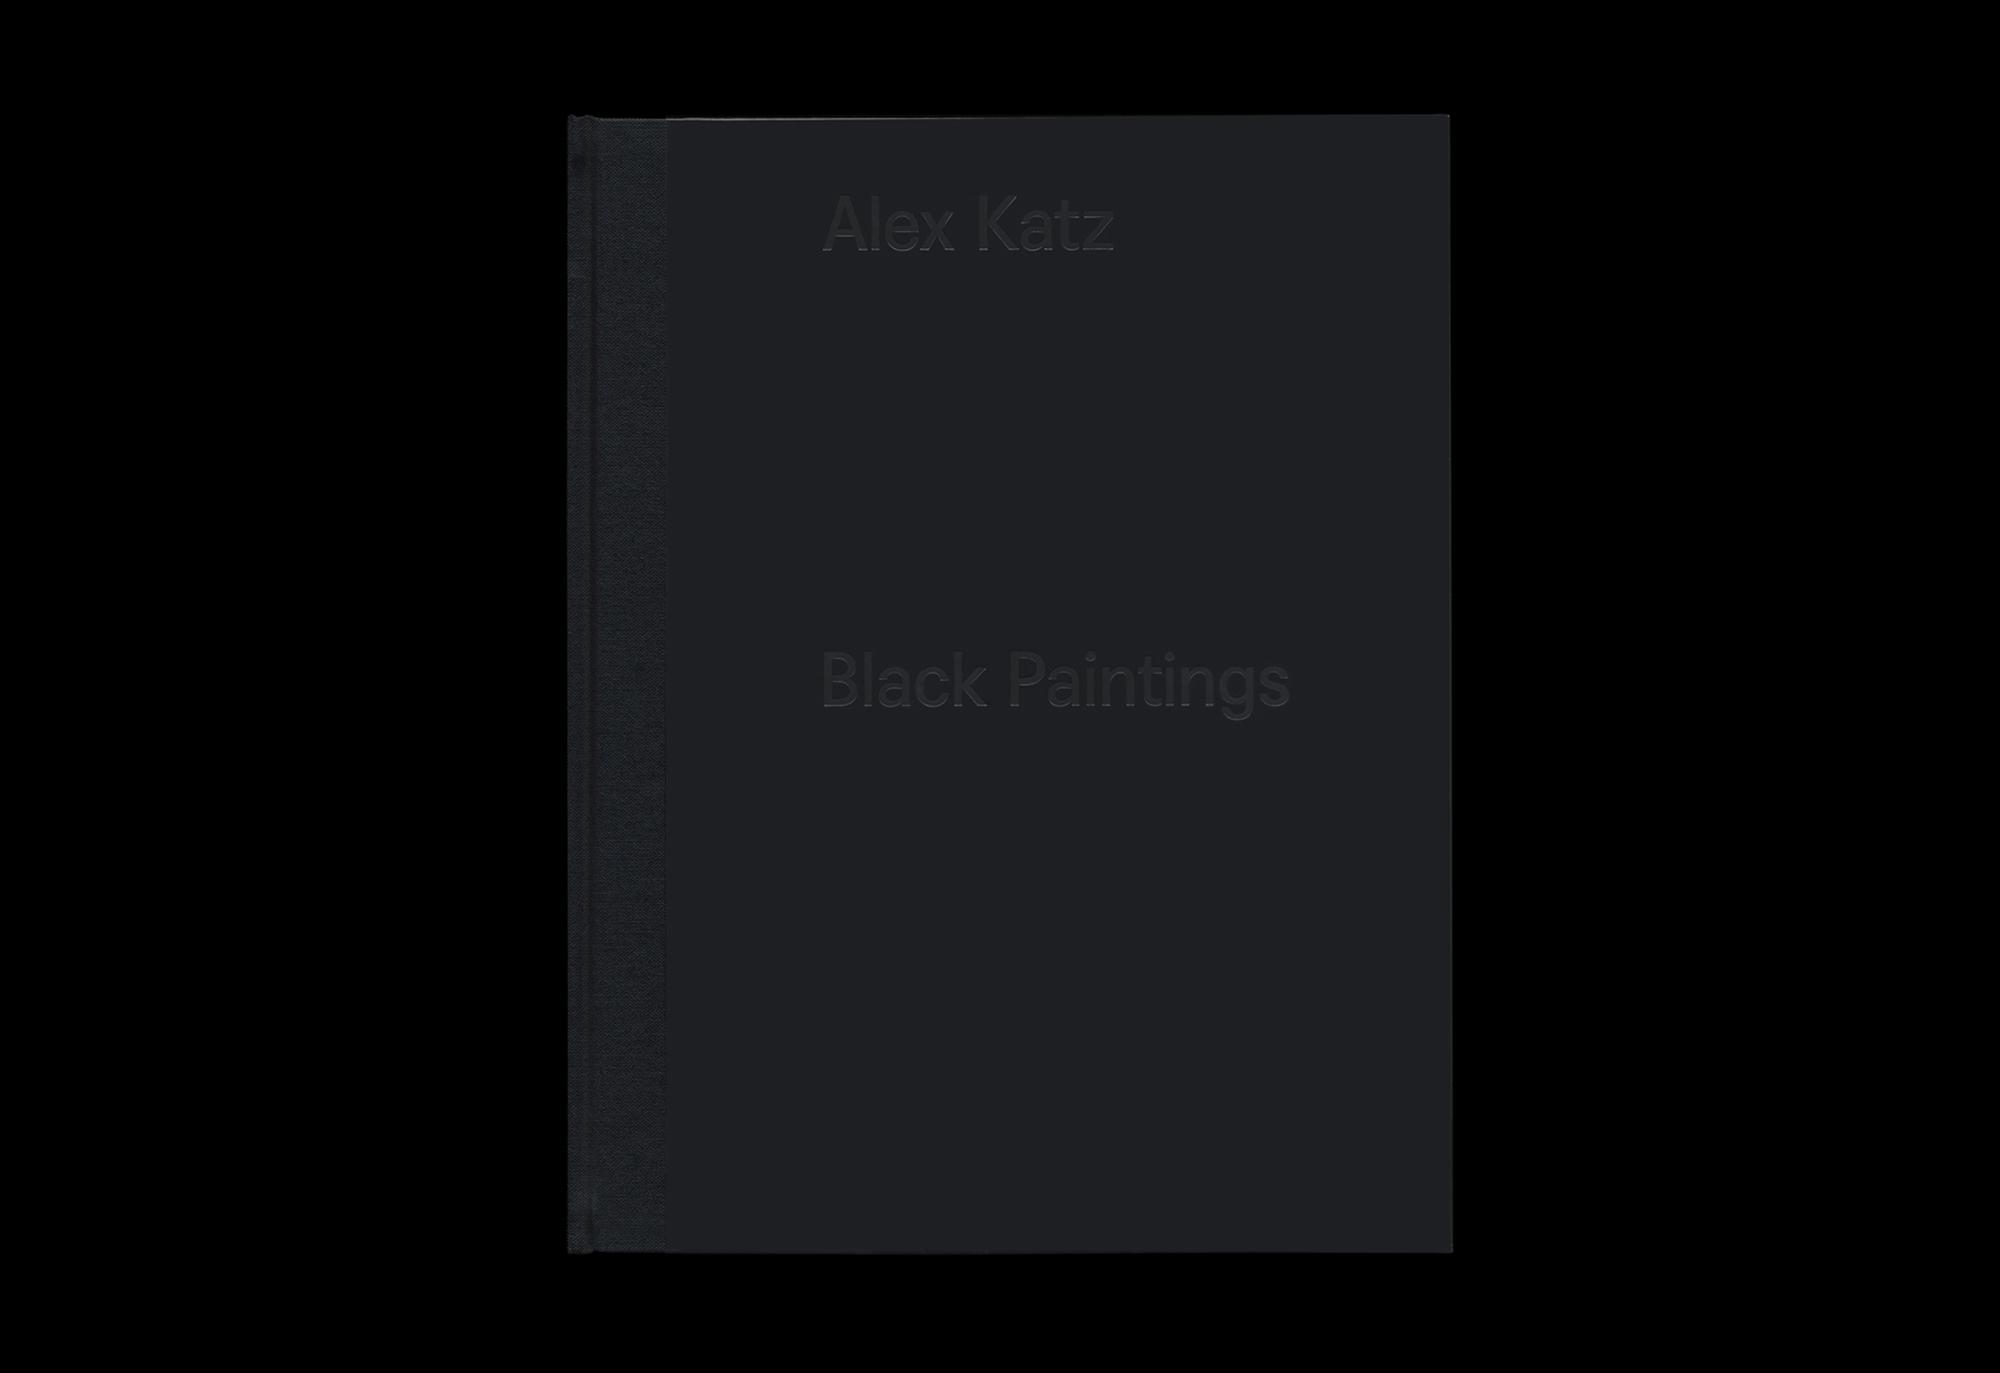 Cover image: Alex Katz: Black Paintings (2015)